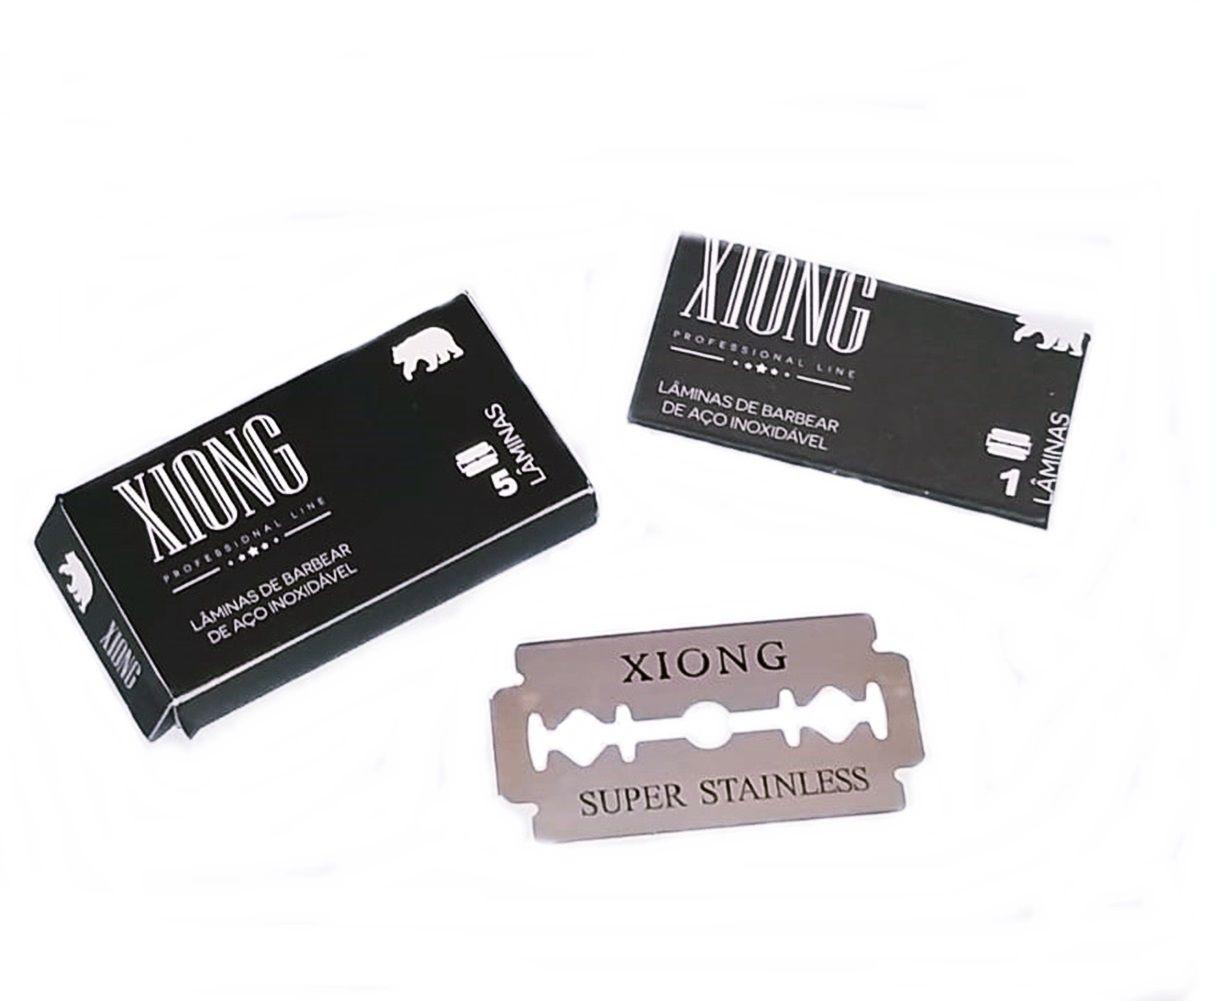 Lâmina Para Barbear Profissional Xiong Caixa Com 100 Unidades